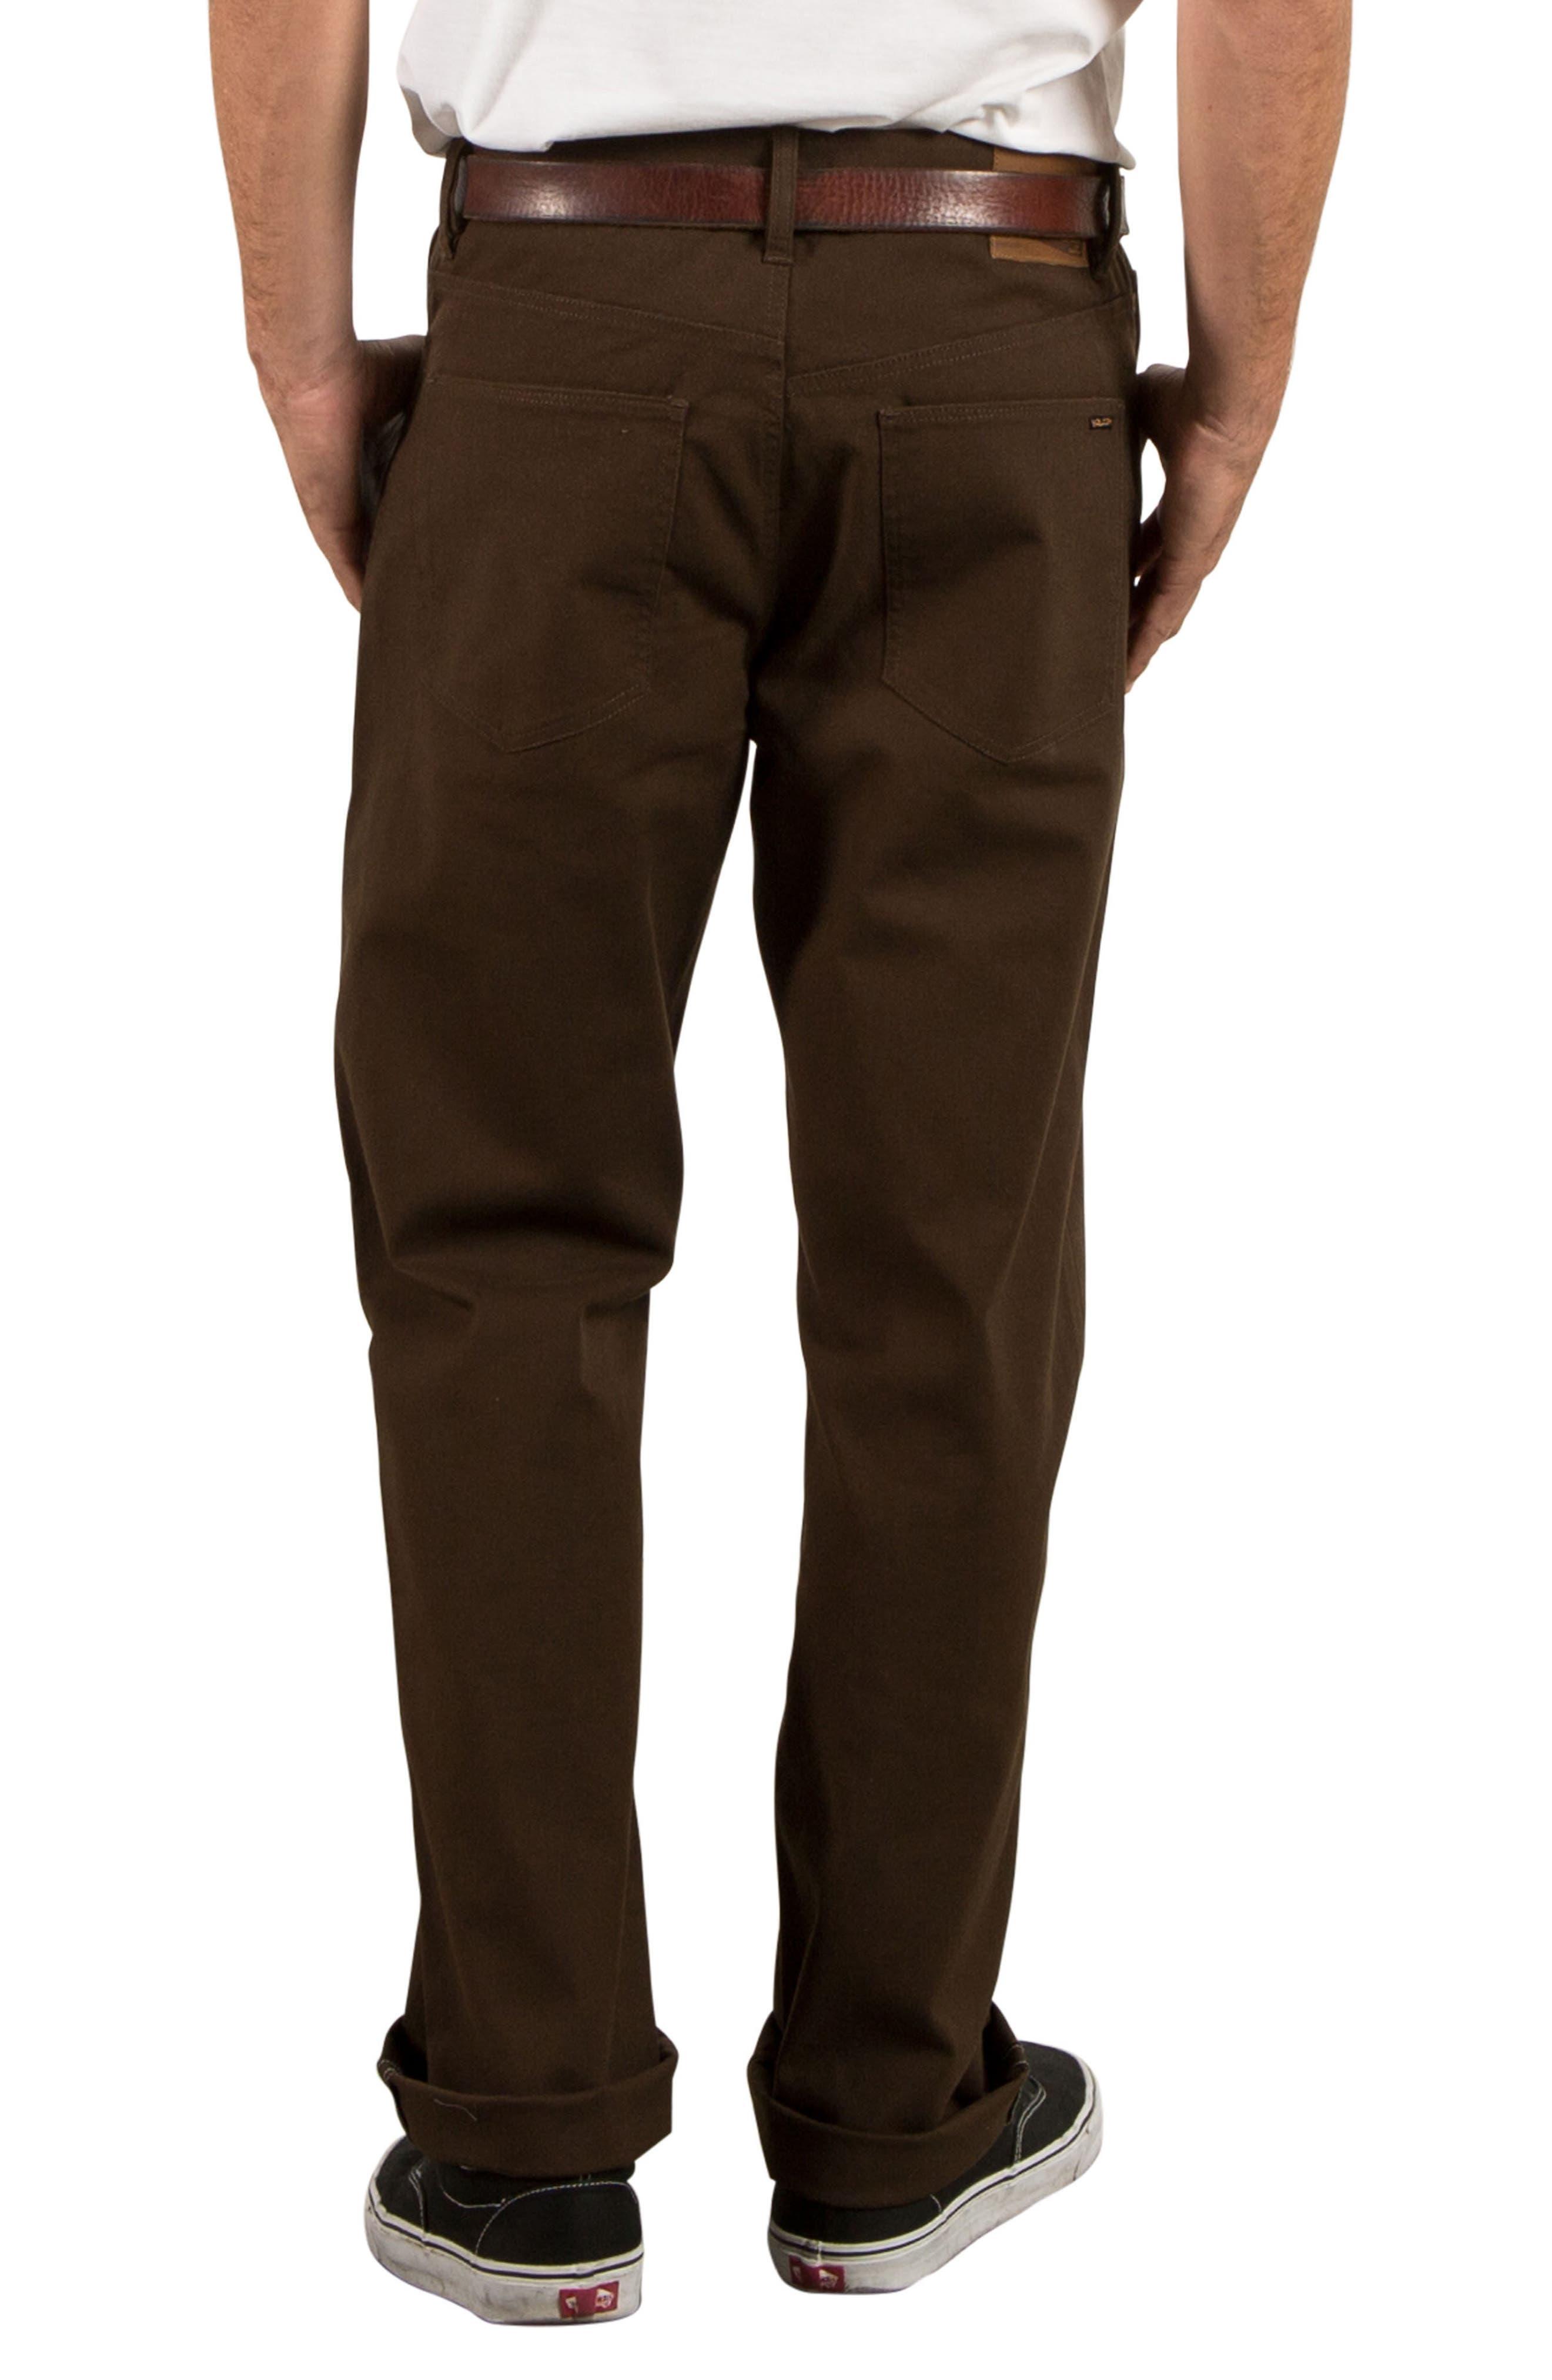 Kinkade Five-Pocket Thrifter Pants,                             Alternate thumbnail 2, color,                             Dark Chocolate